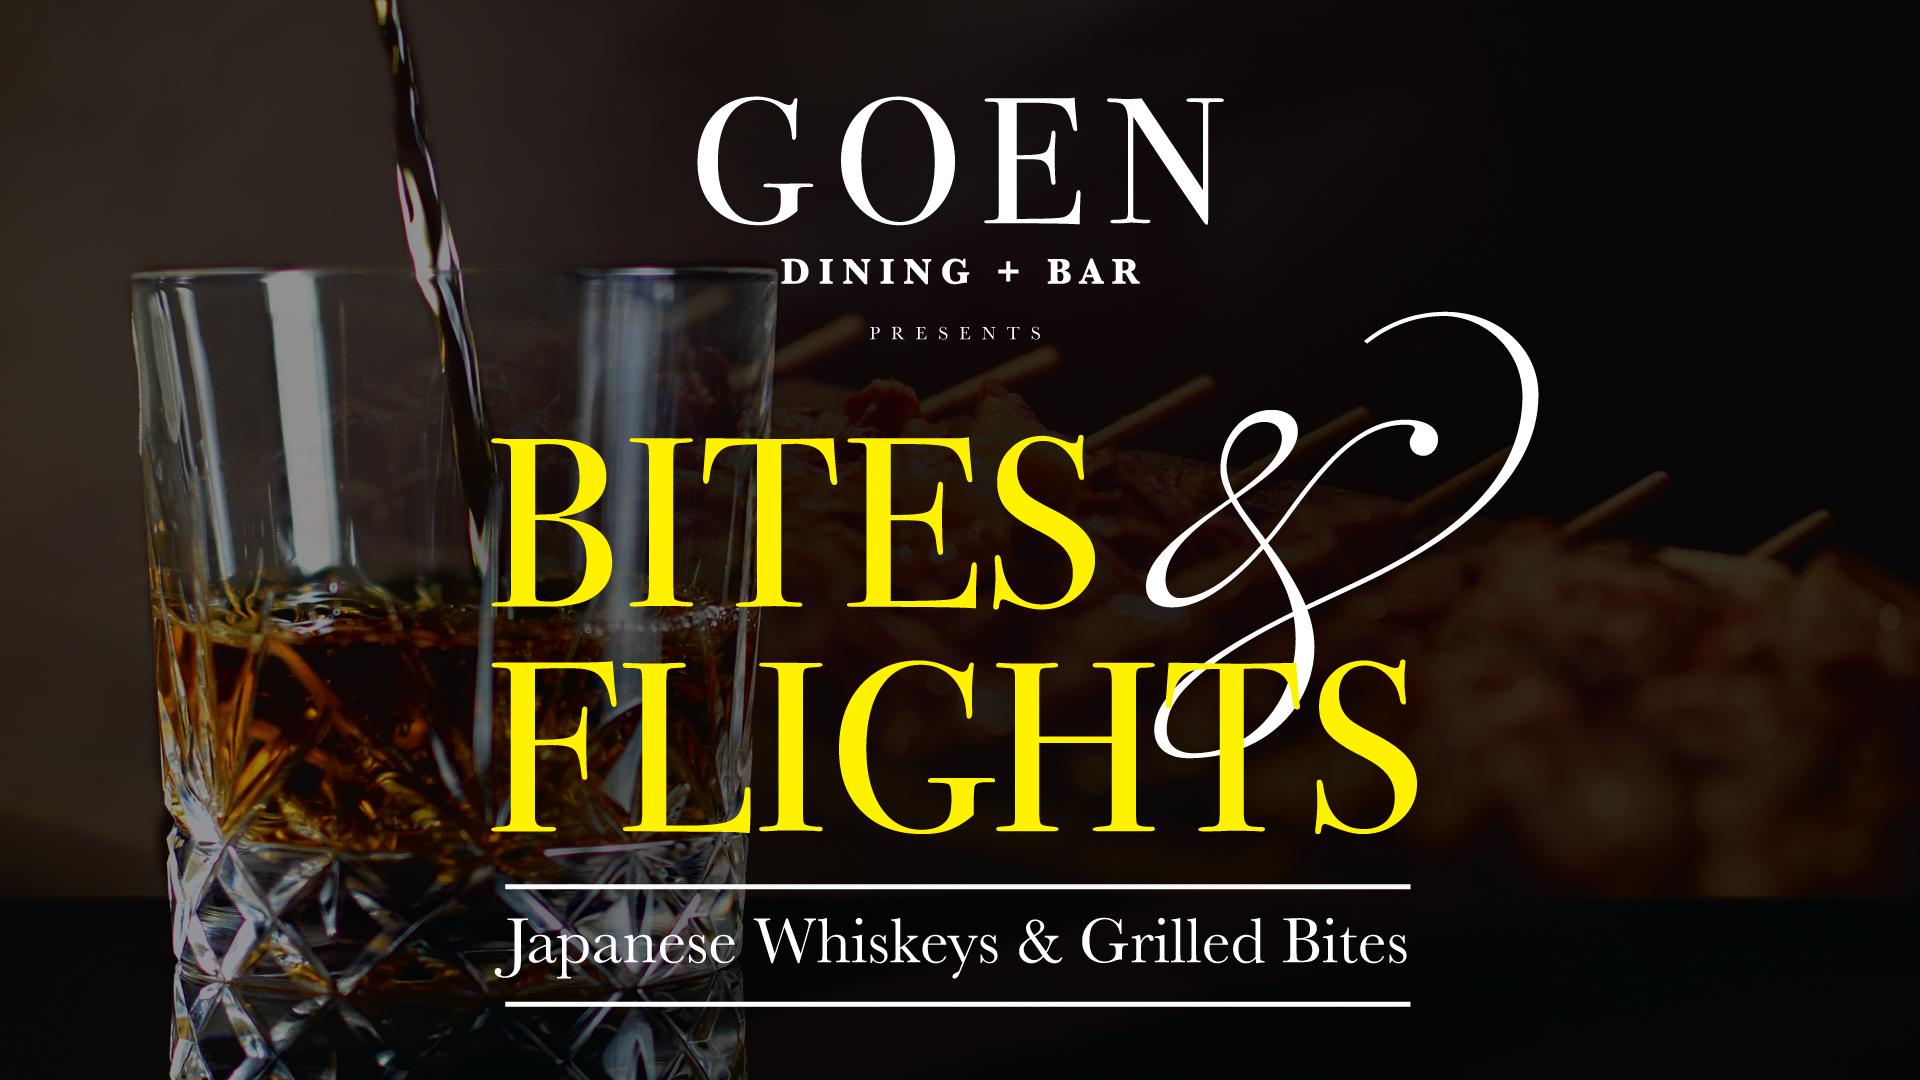 Goen_bites-flights-web.jpg